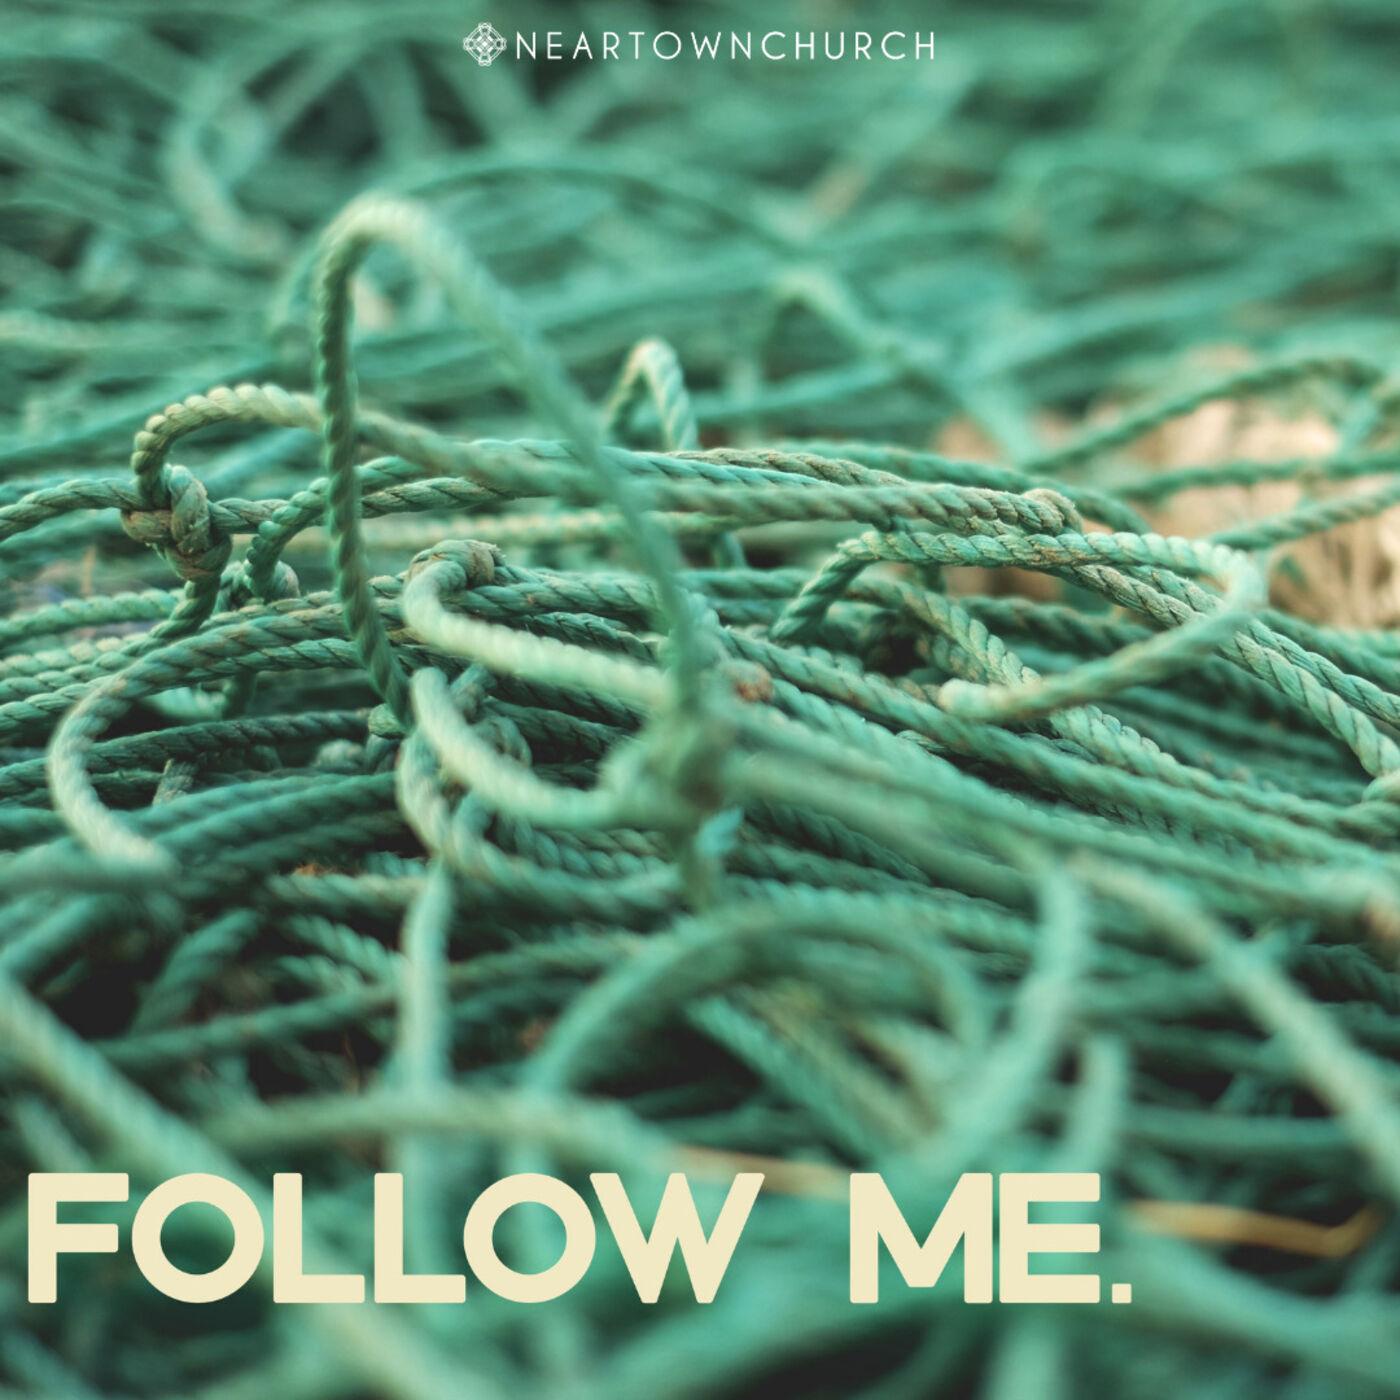 Follow Me - 11.8.2020